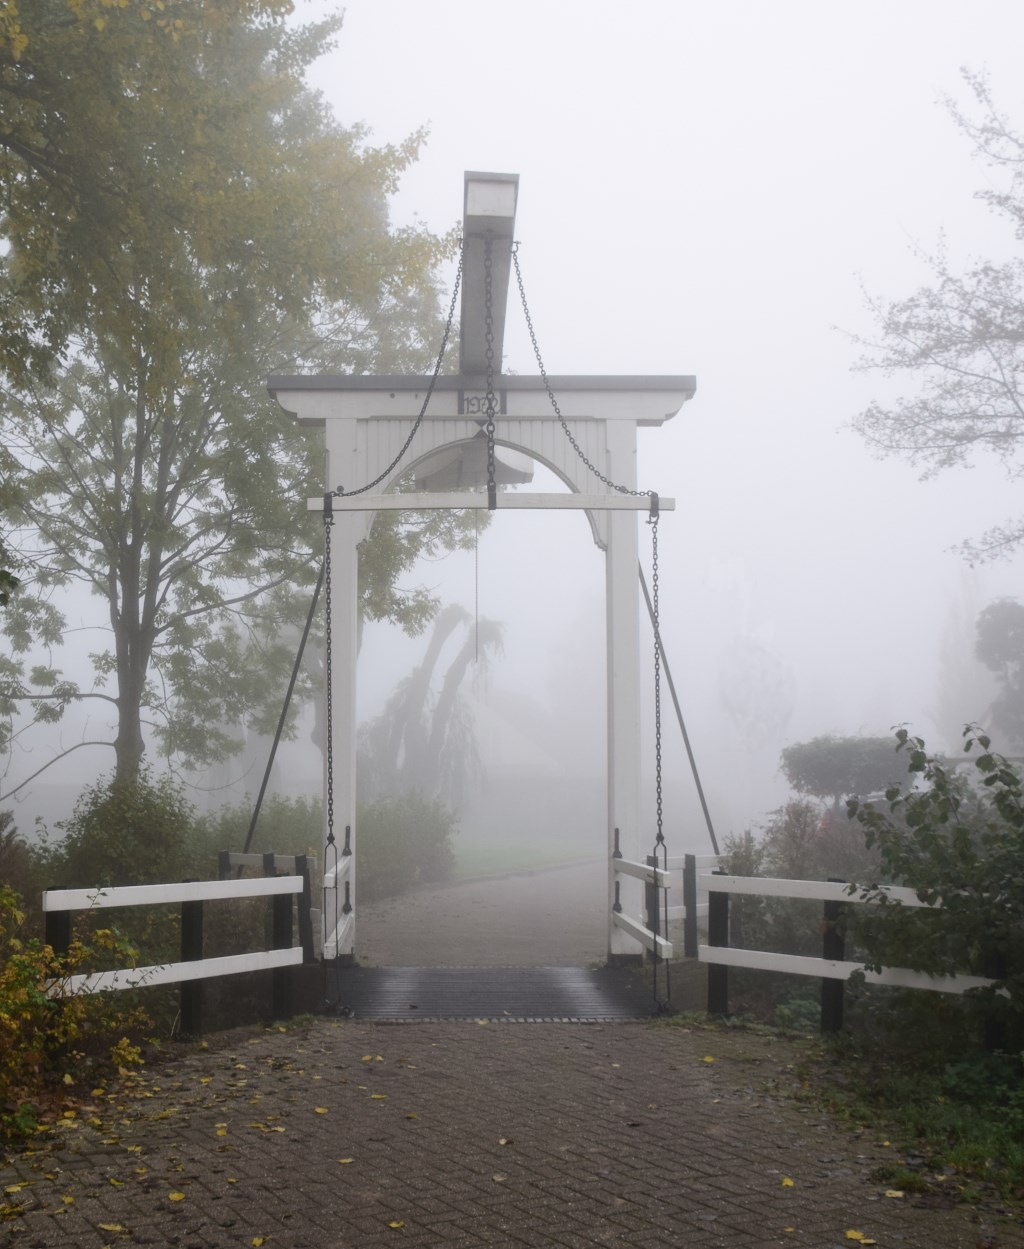 Het bruggetje bij Tennisvereniging Santana in de mist. (Foto: Gerard Eilander) © rodi